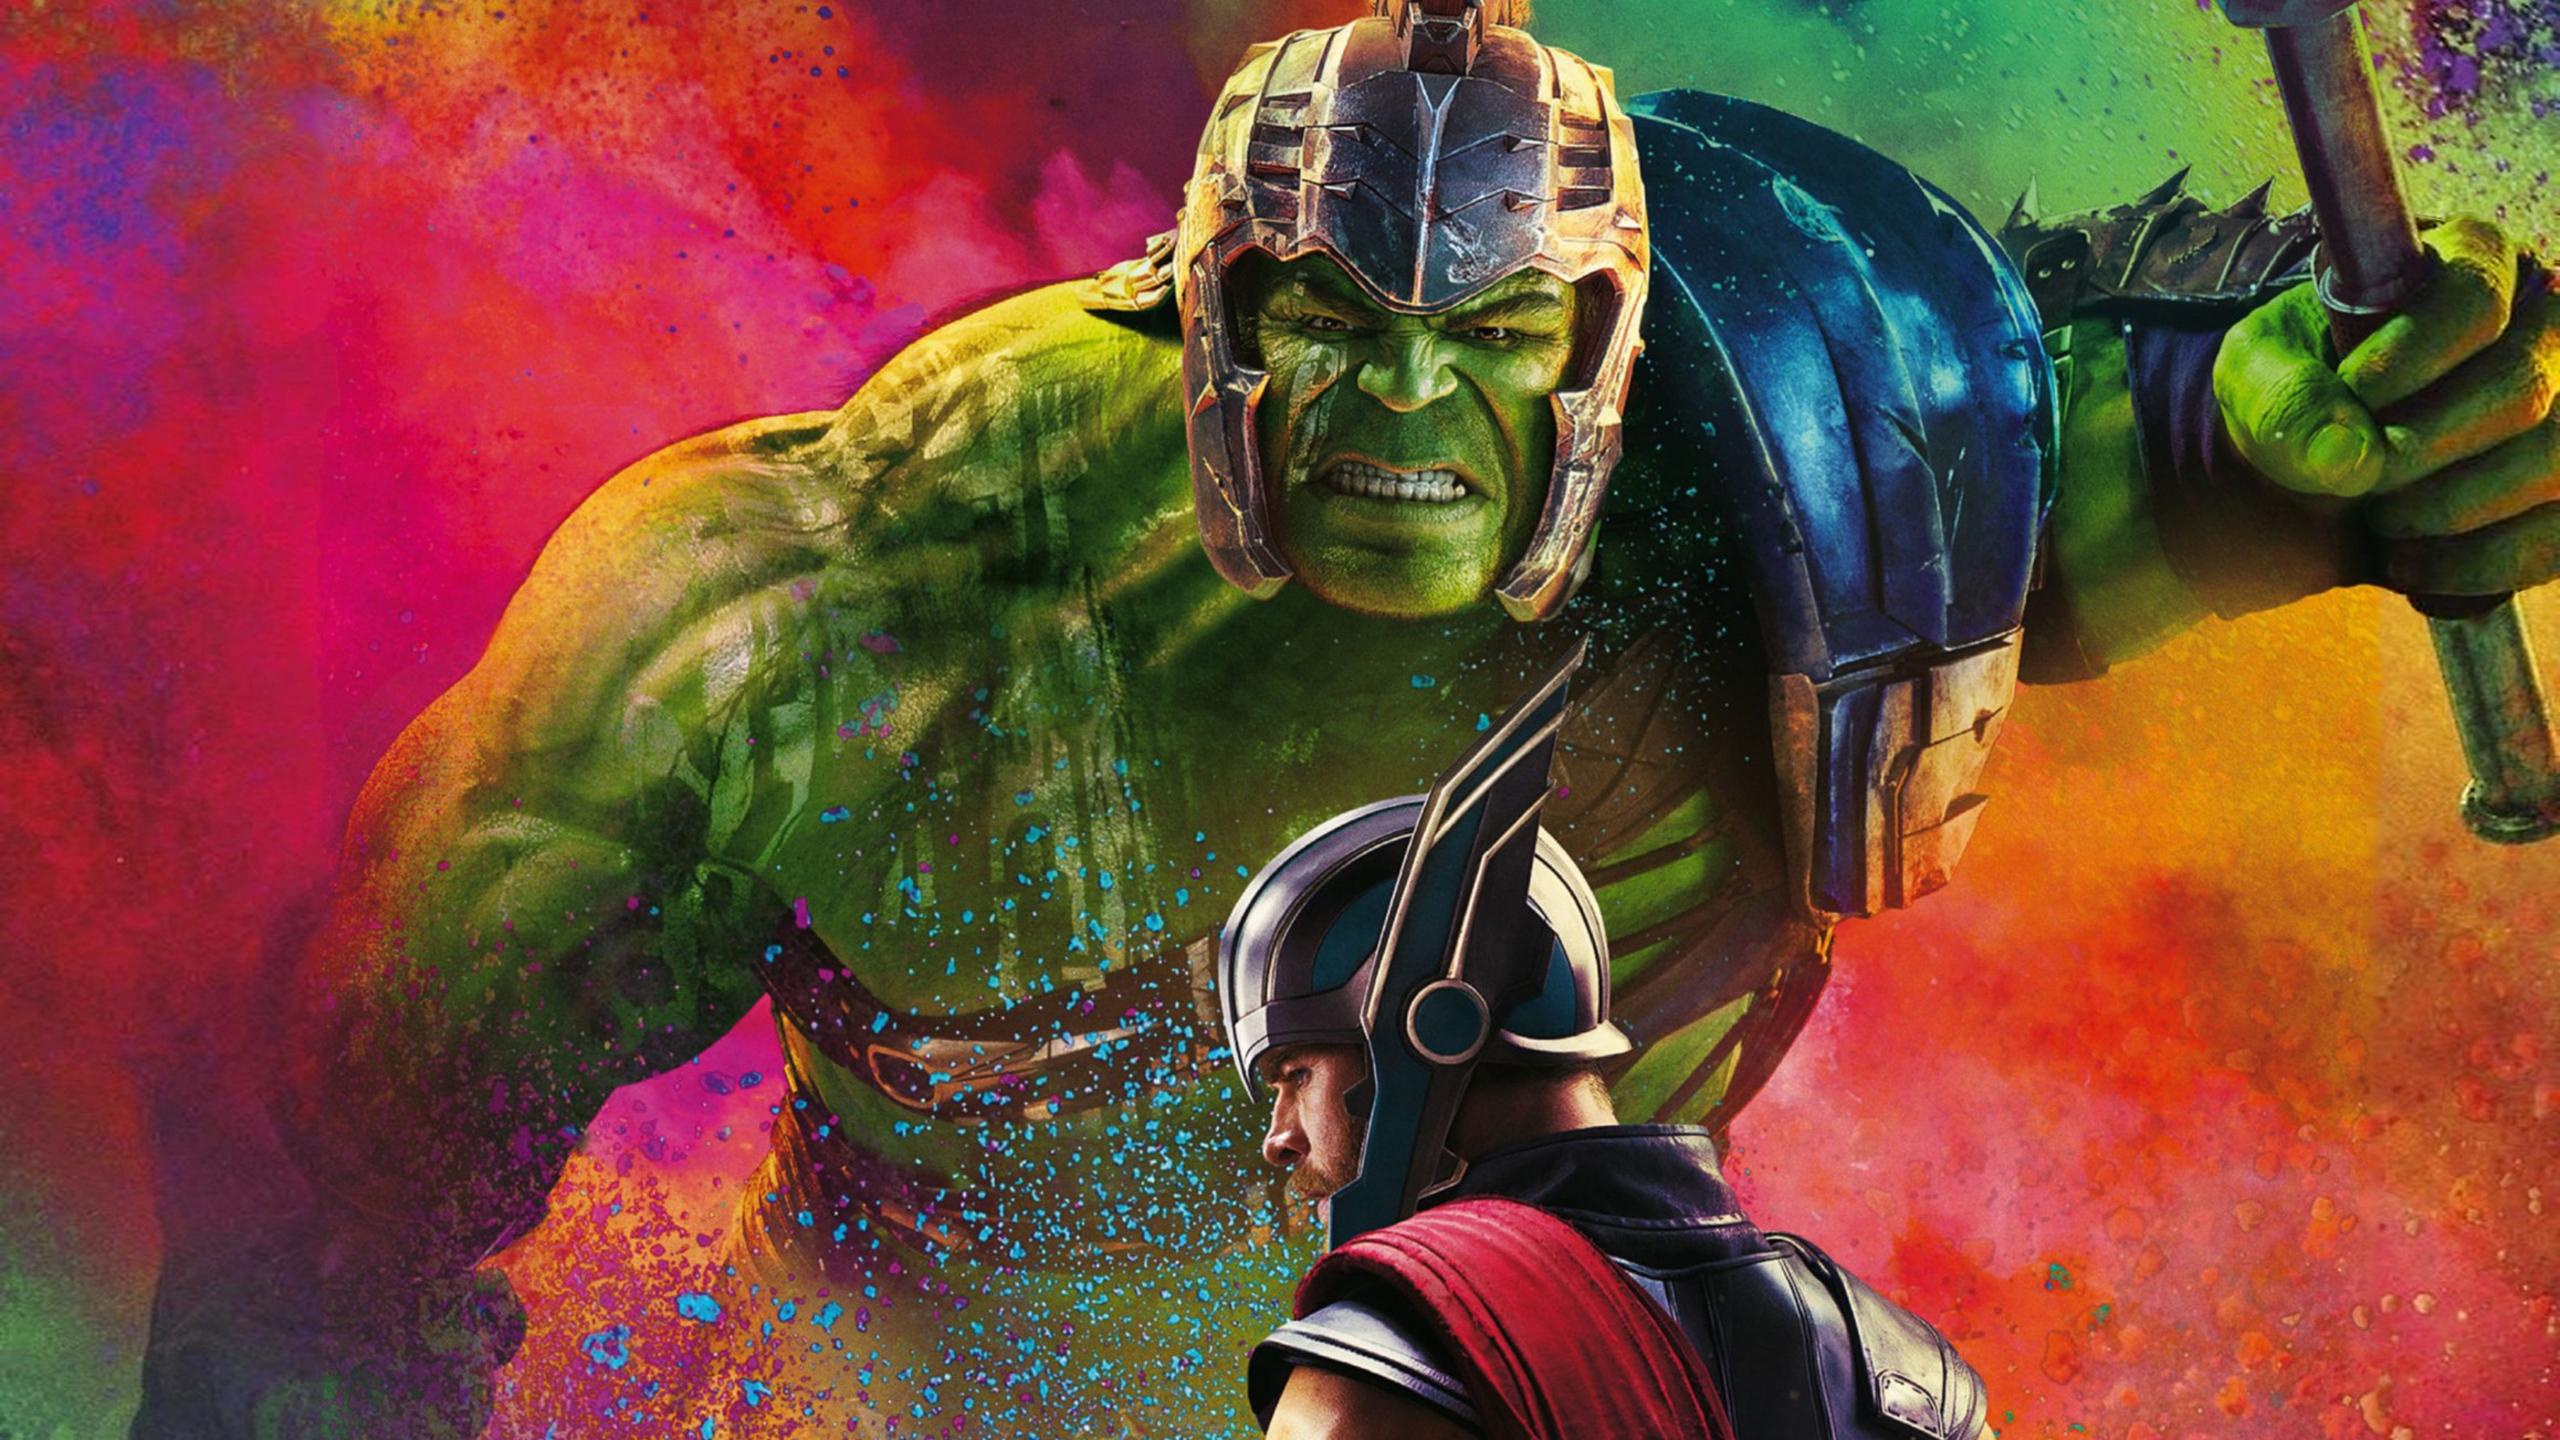 2560x1440 Thor Hulk In Thor Ragnarok 1440p Resolution Hd 4k